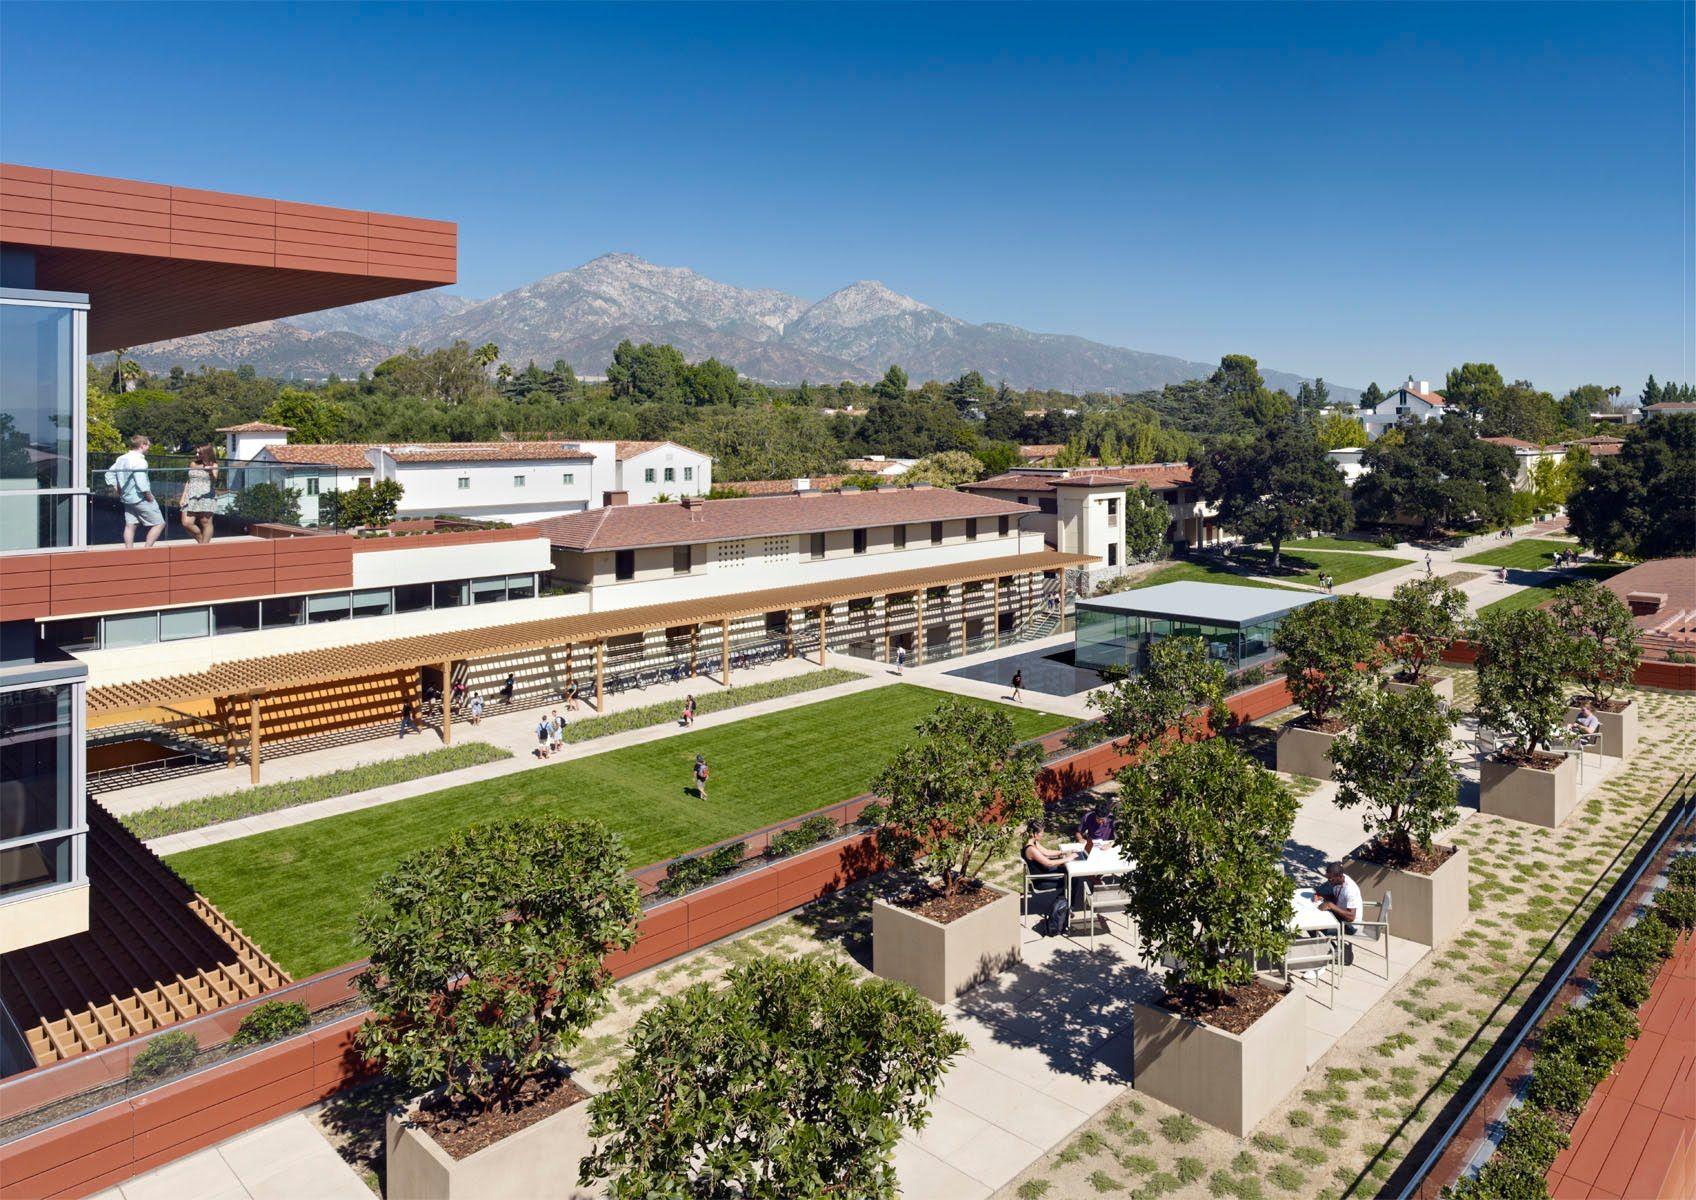 Claremont McKenna College Review | Colleges & Universities